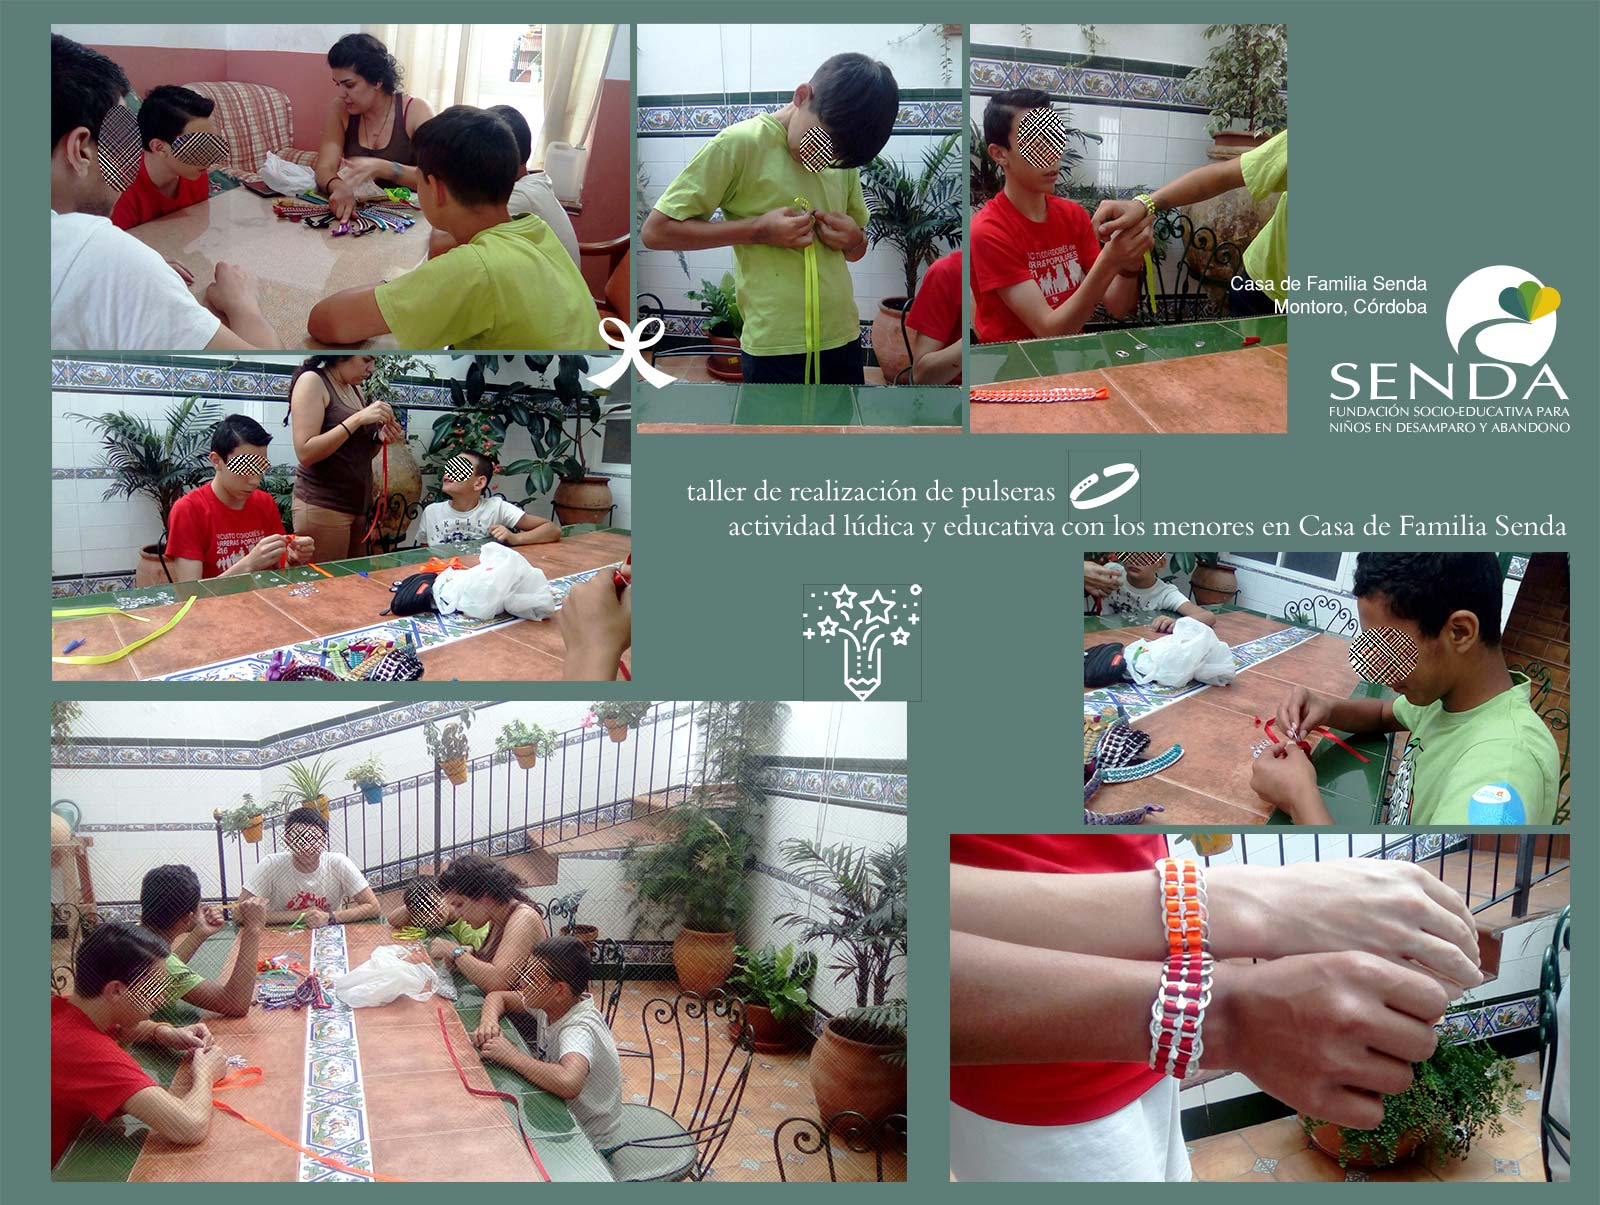 talleres educativos pulseras Casa de Familia Senda Montoro